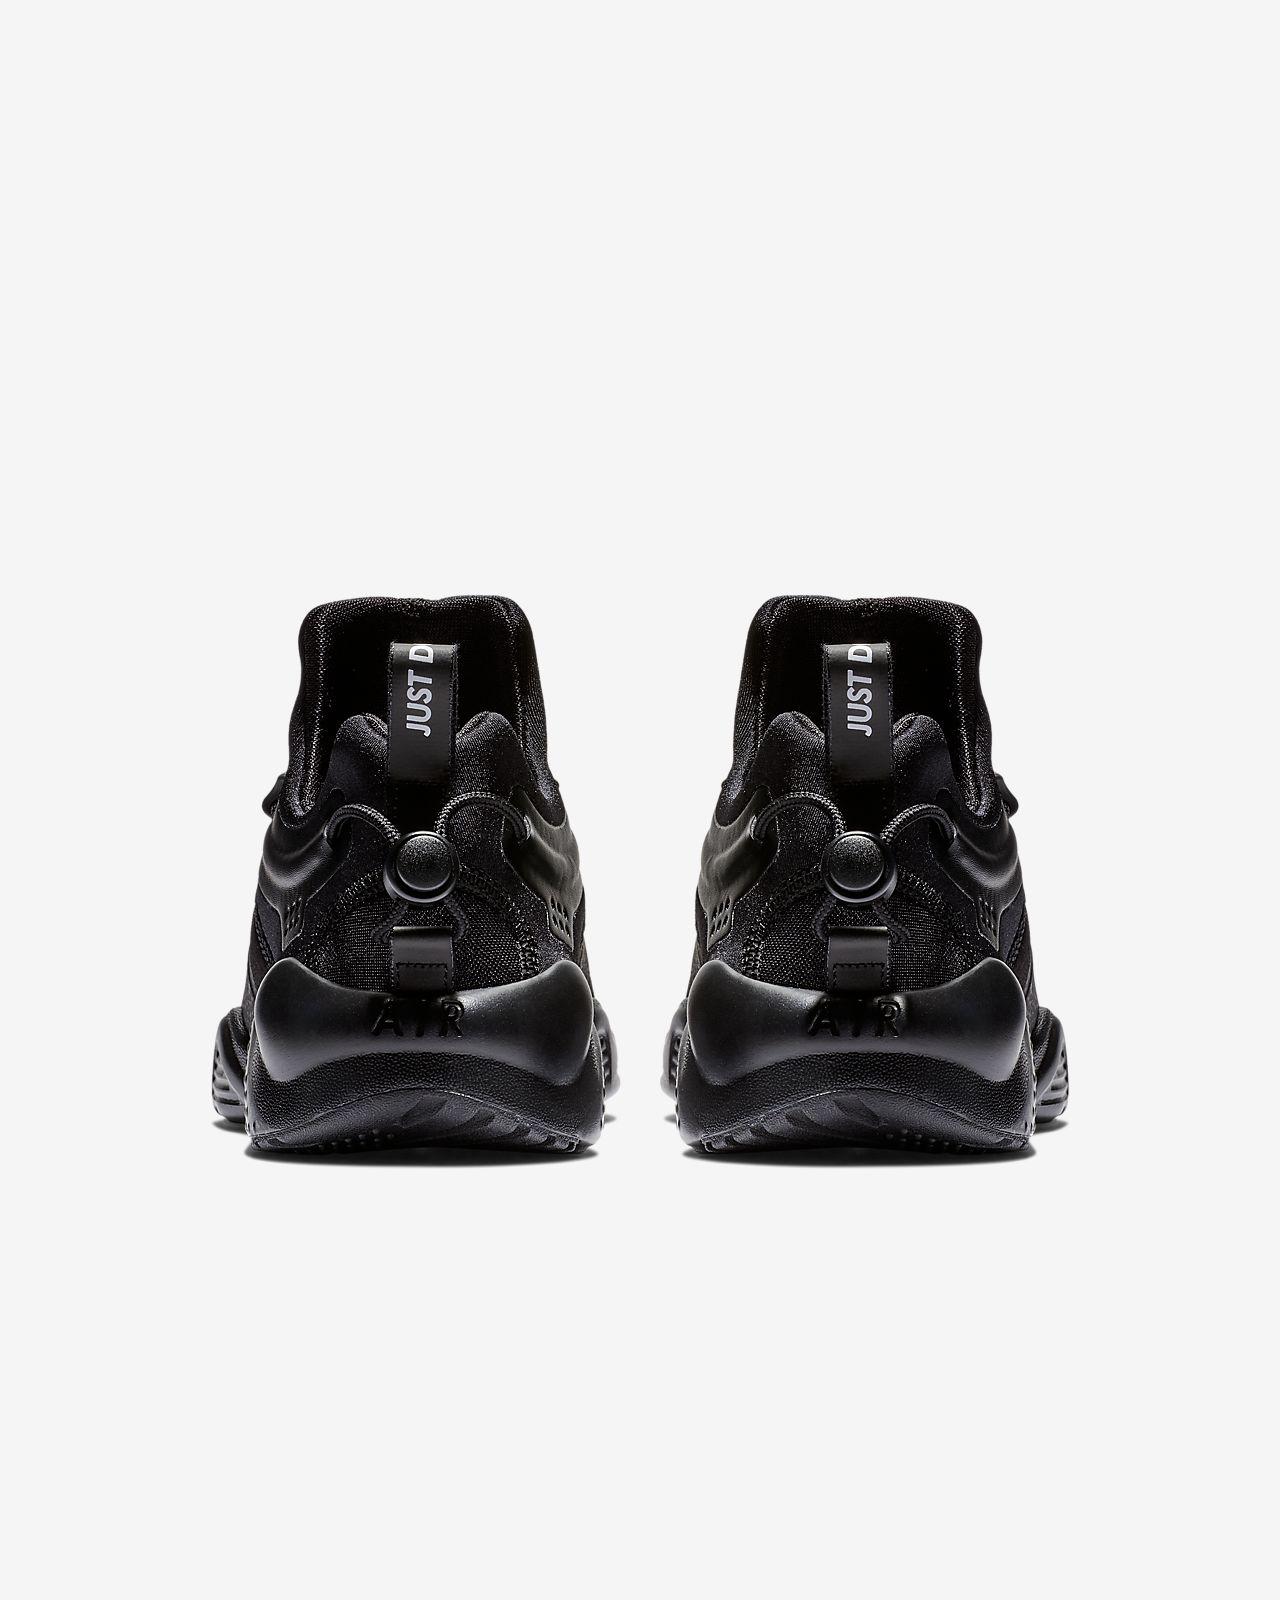 outlet store 619fa 7ad51 ... Nike Air Huarache City Move Women s Shoe